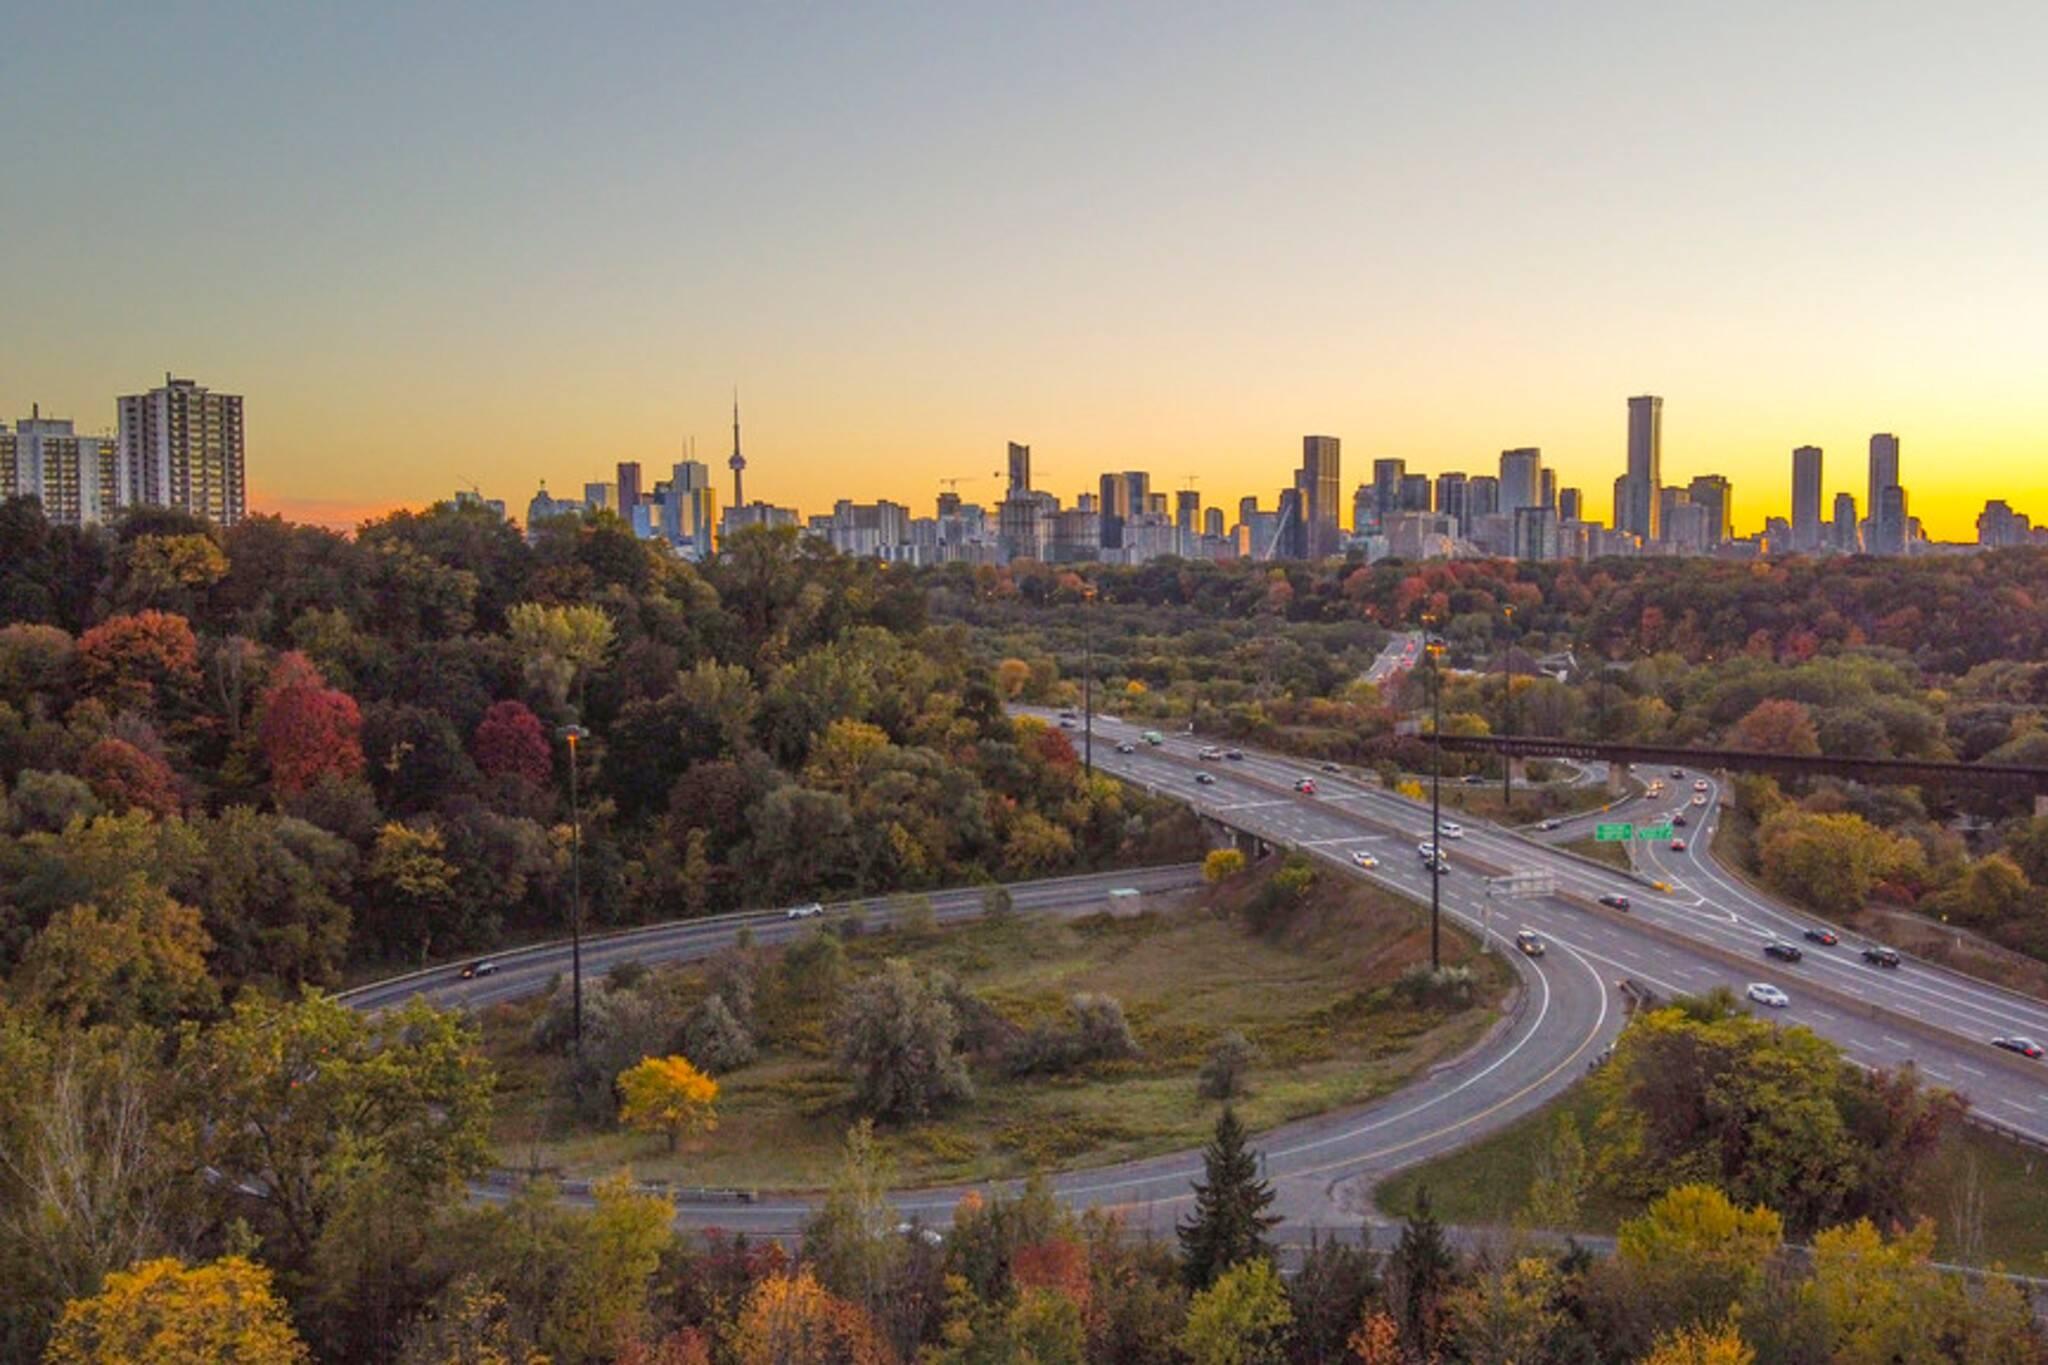 worlds best cities report